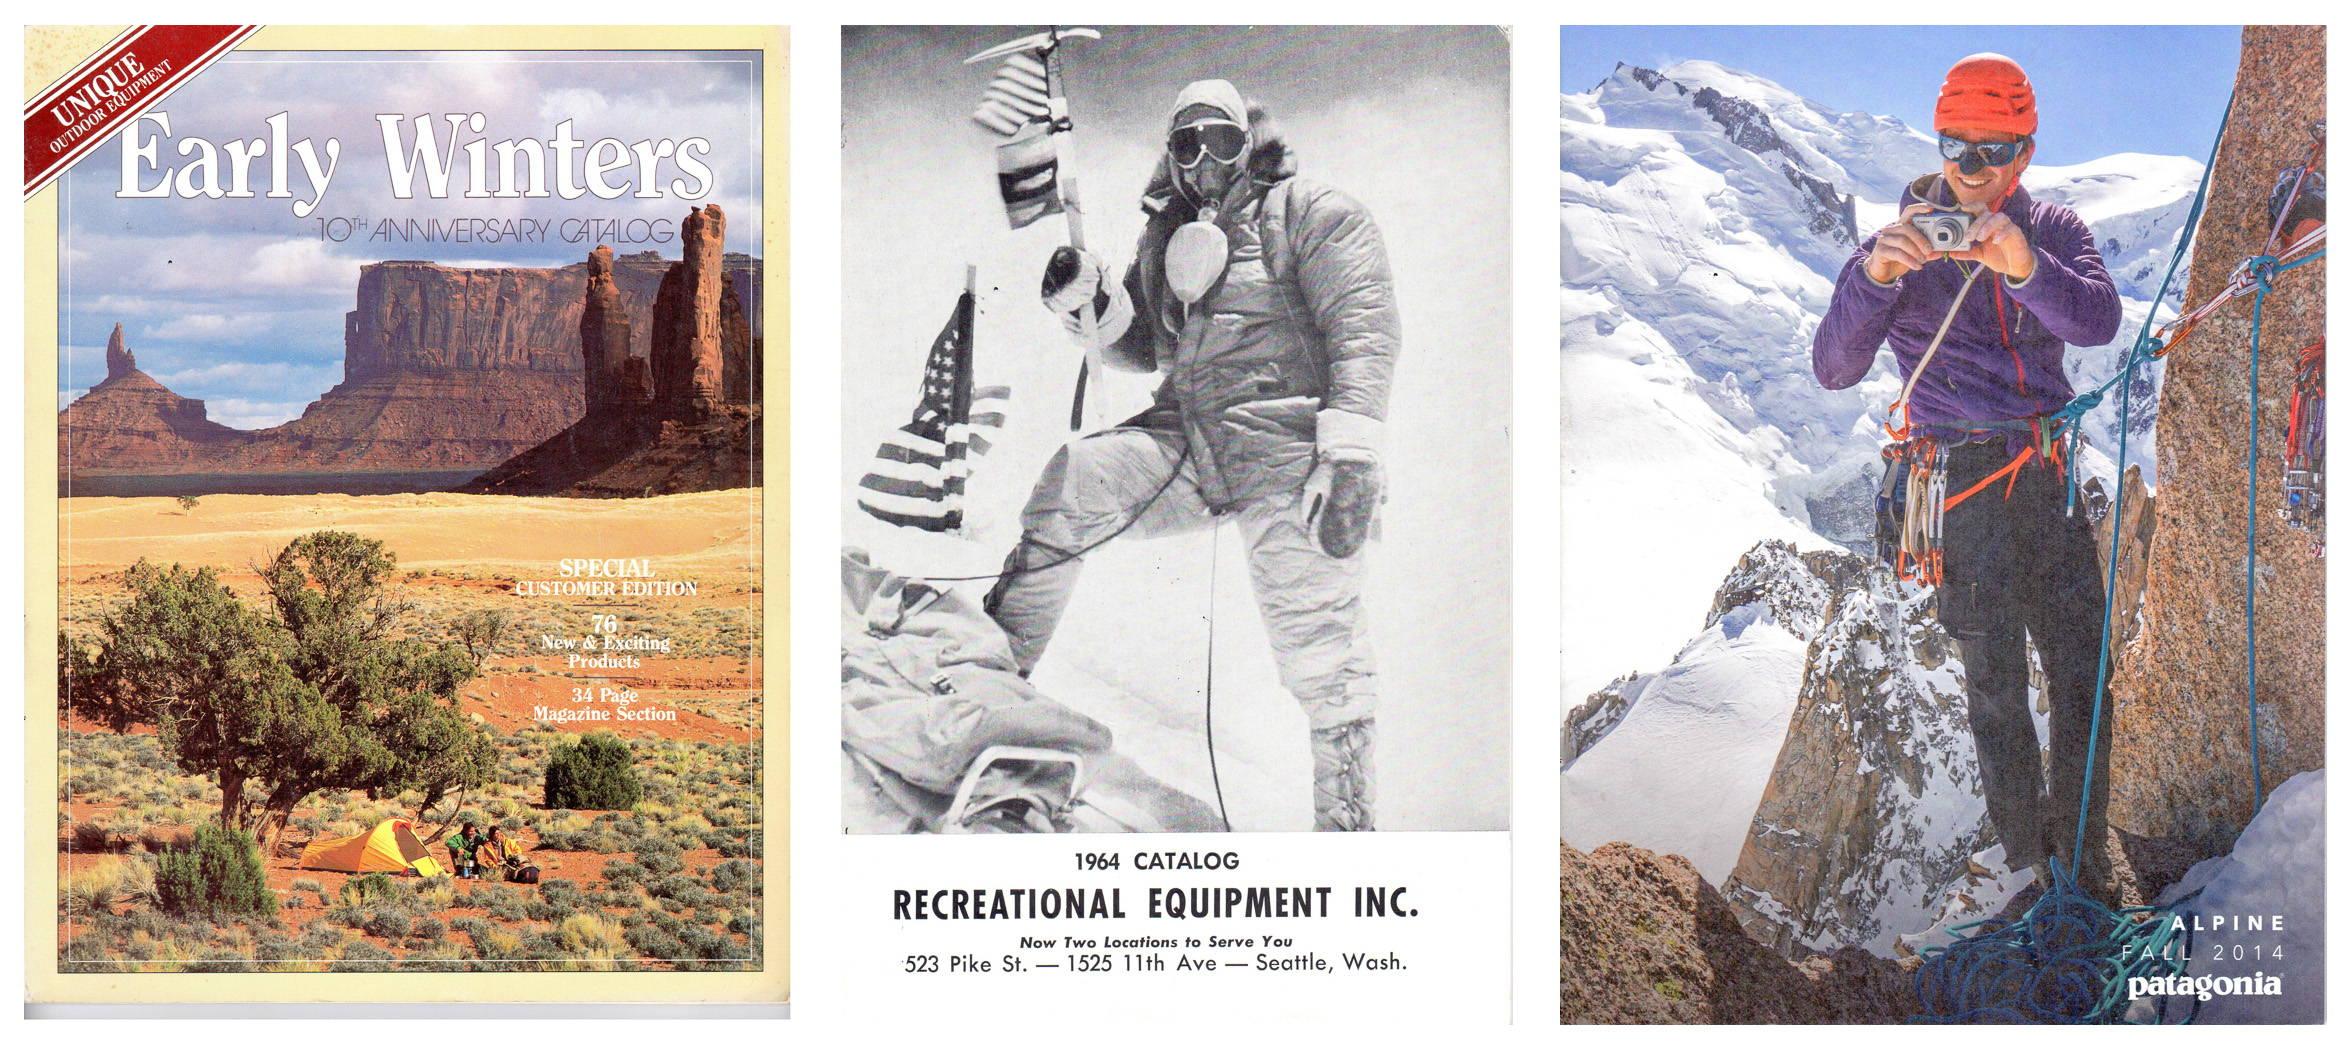 Early Winters Catalog 1982; REI Catalog 1964; Patagonia Catalog Fall 2014